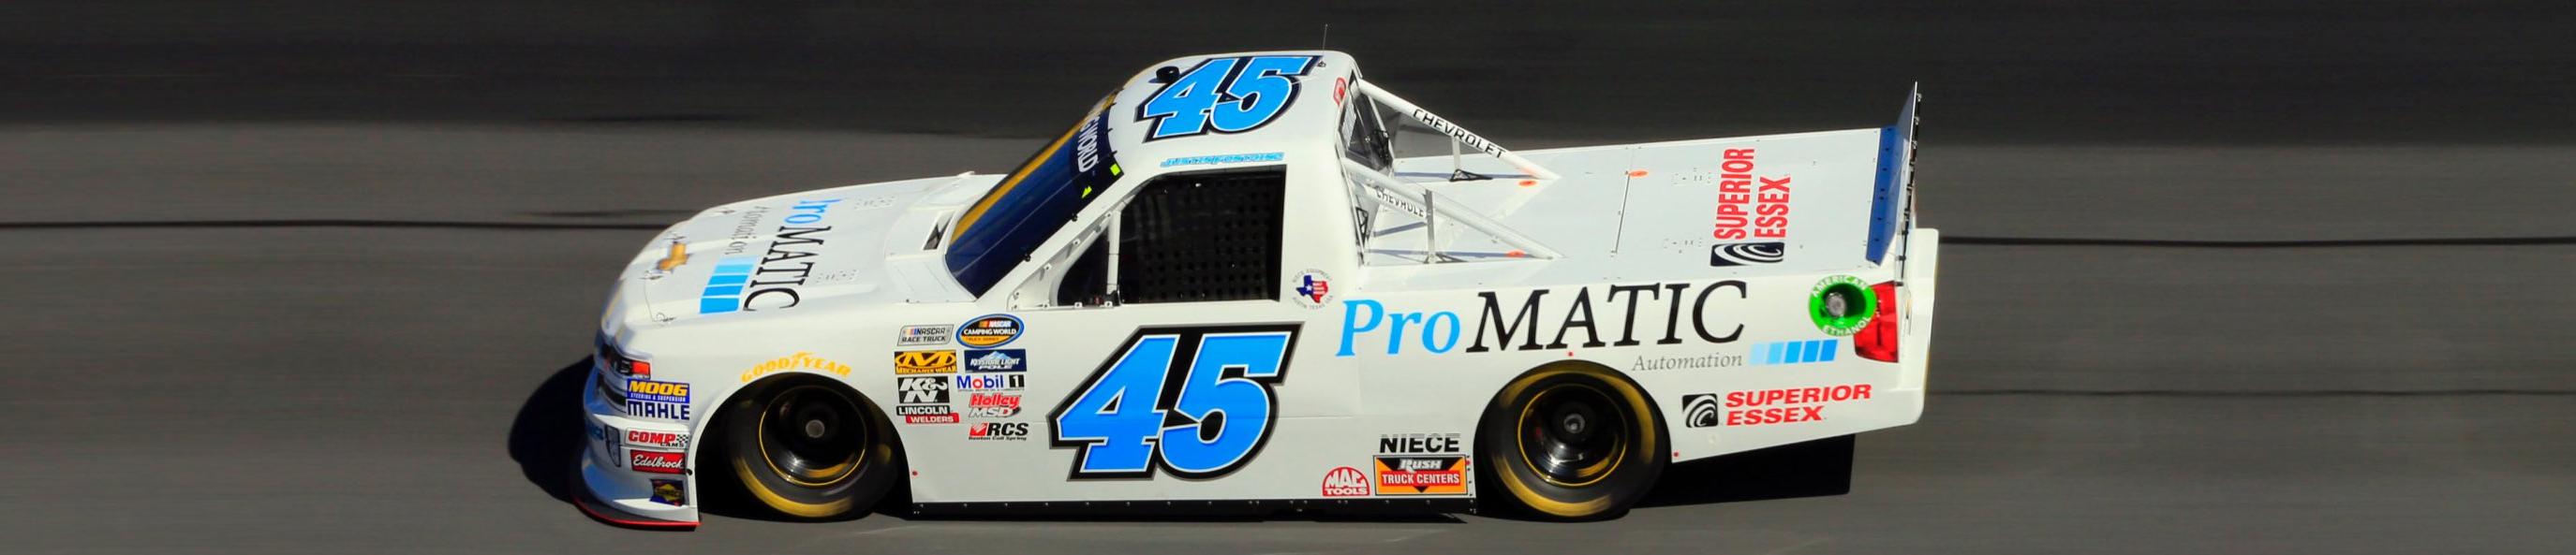 ProMATIC Sponsors #45